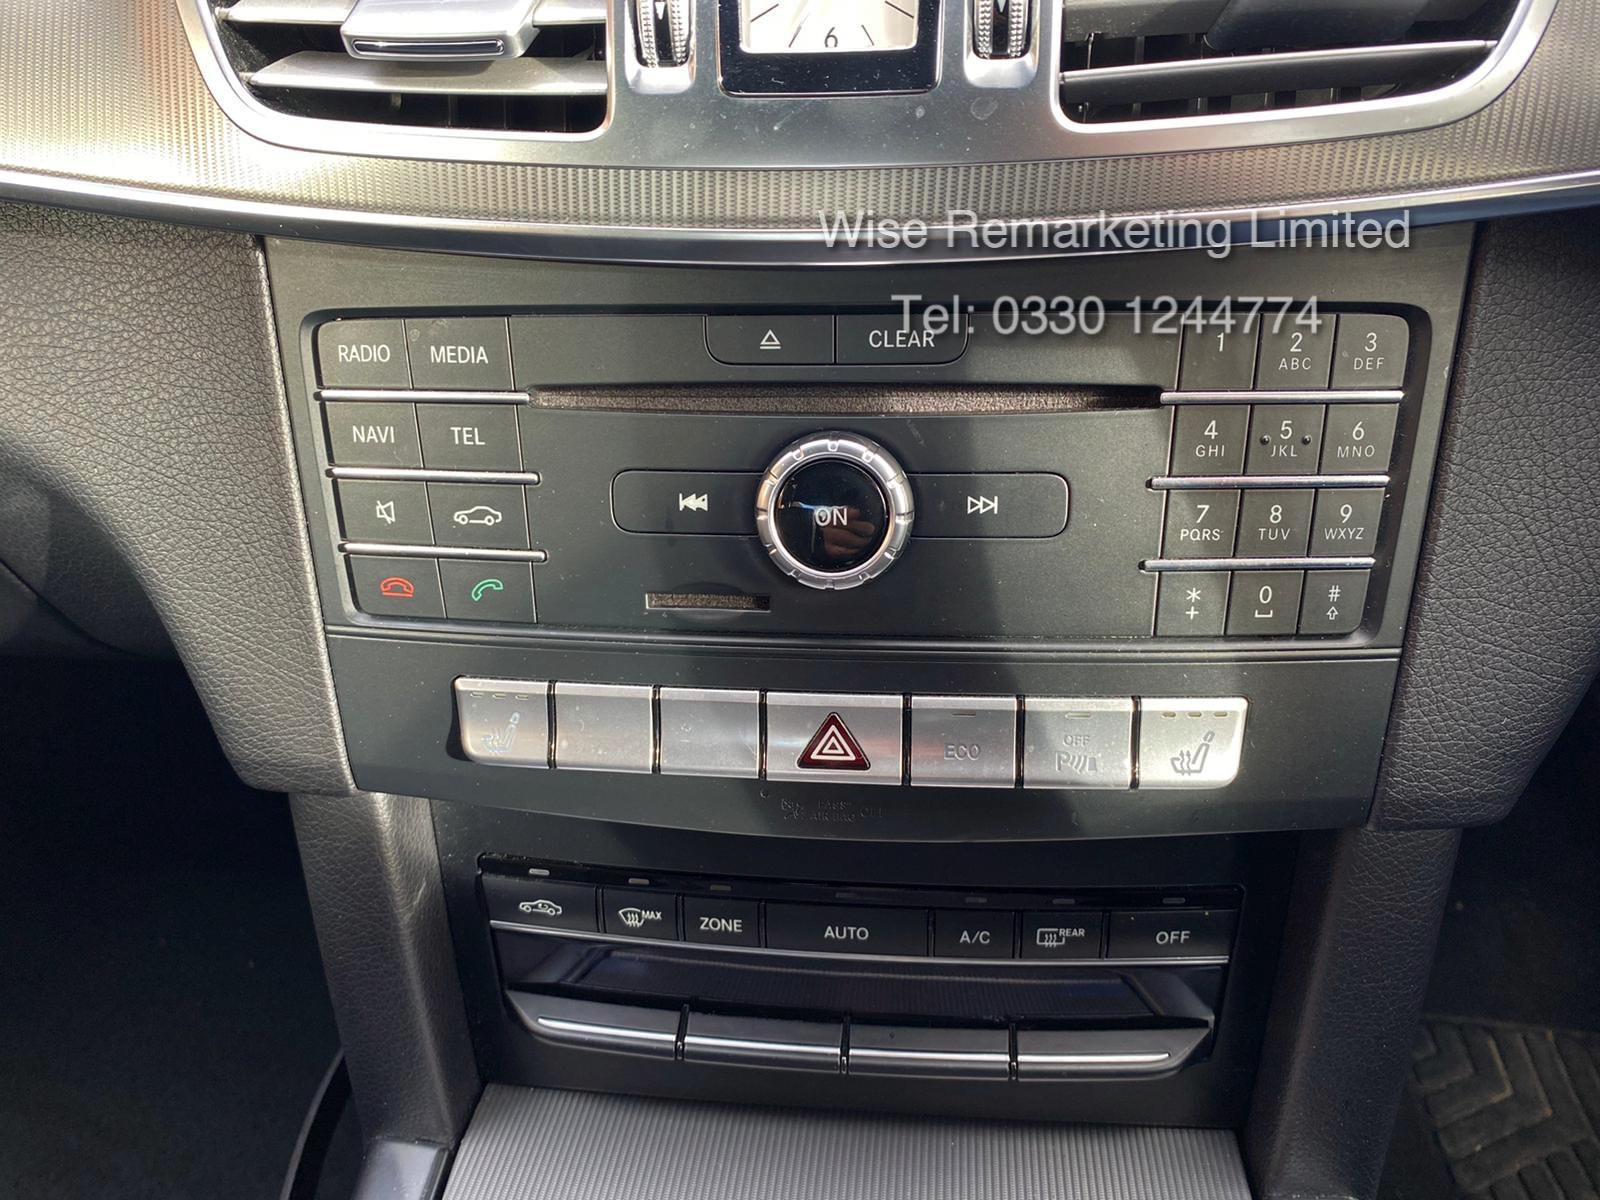 Mercedes E220d 2.1 Special Equipment Auto 2015 15 Reg - 1 Former Keeper - Sat Nav - Parking Sensors - Image 11 of 14